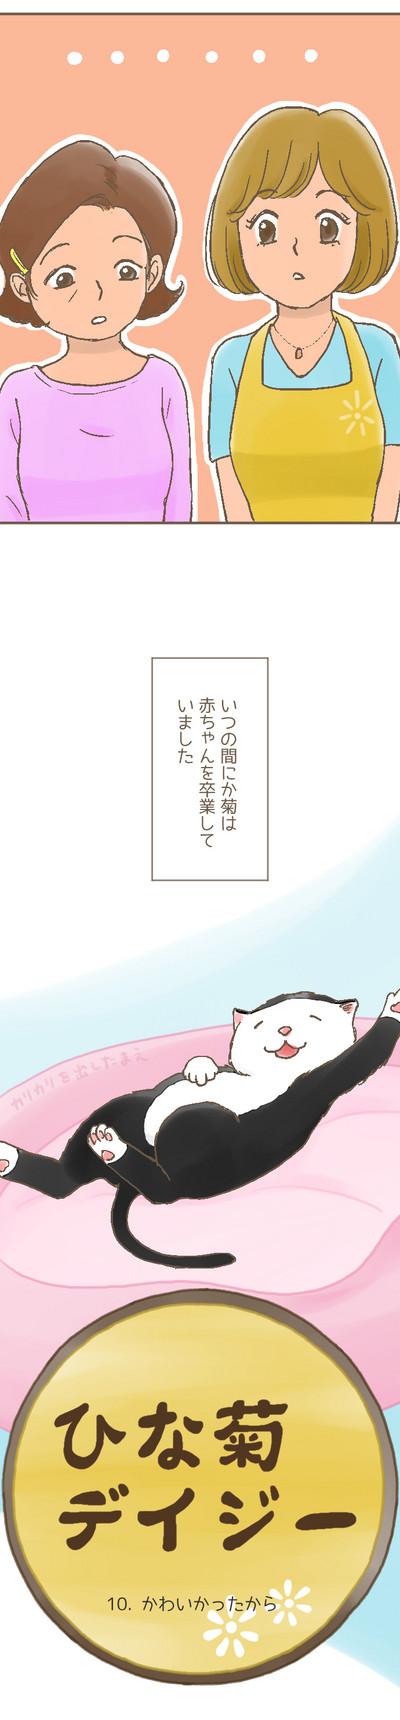 Hinagiku_0010_01